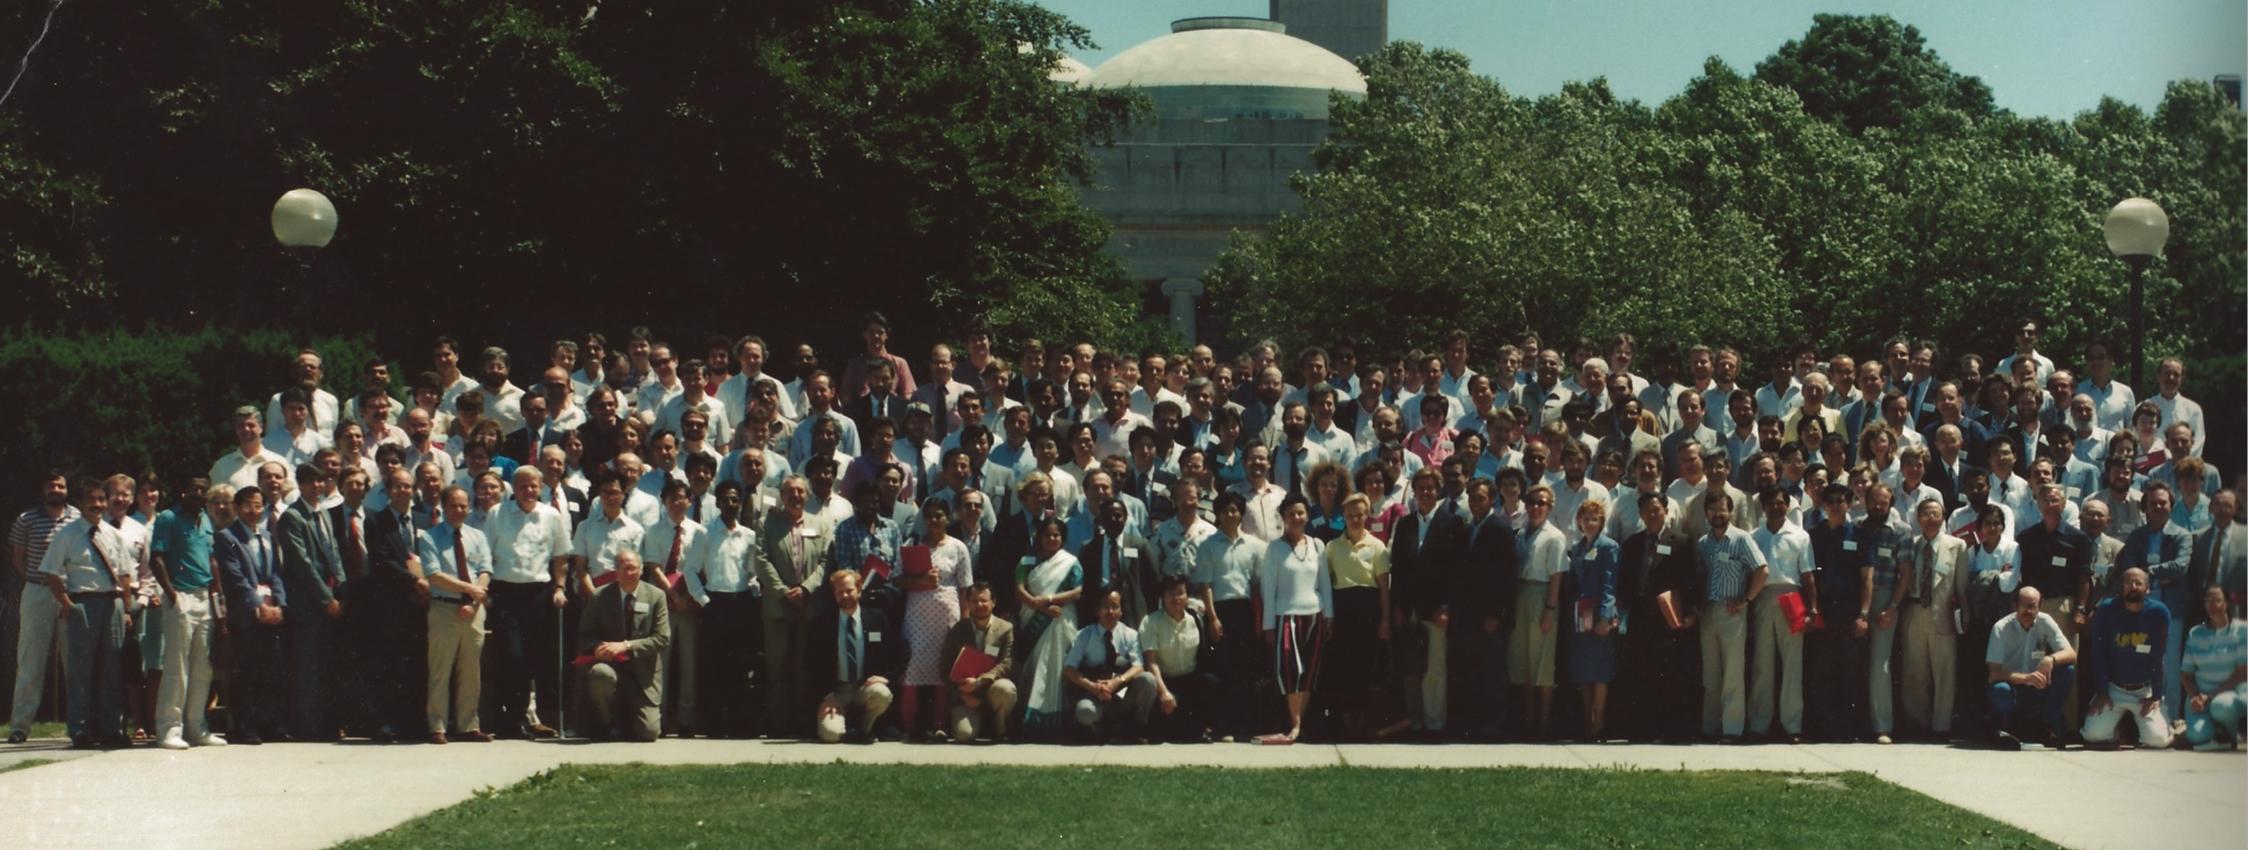 Boston, 1986